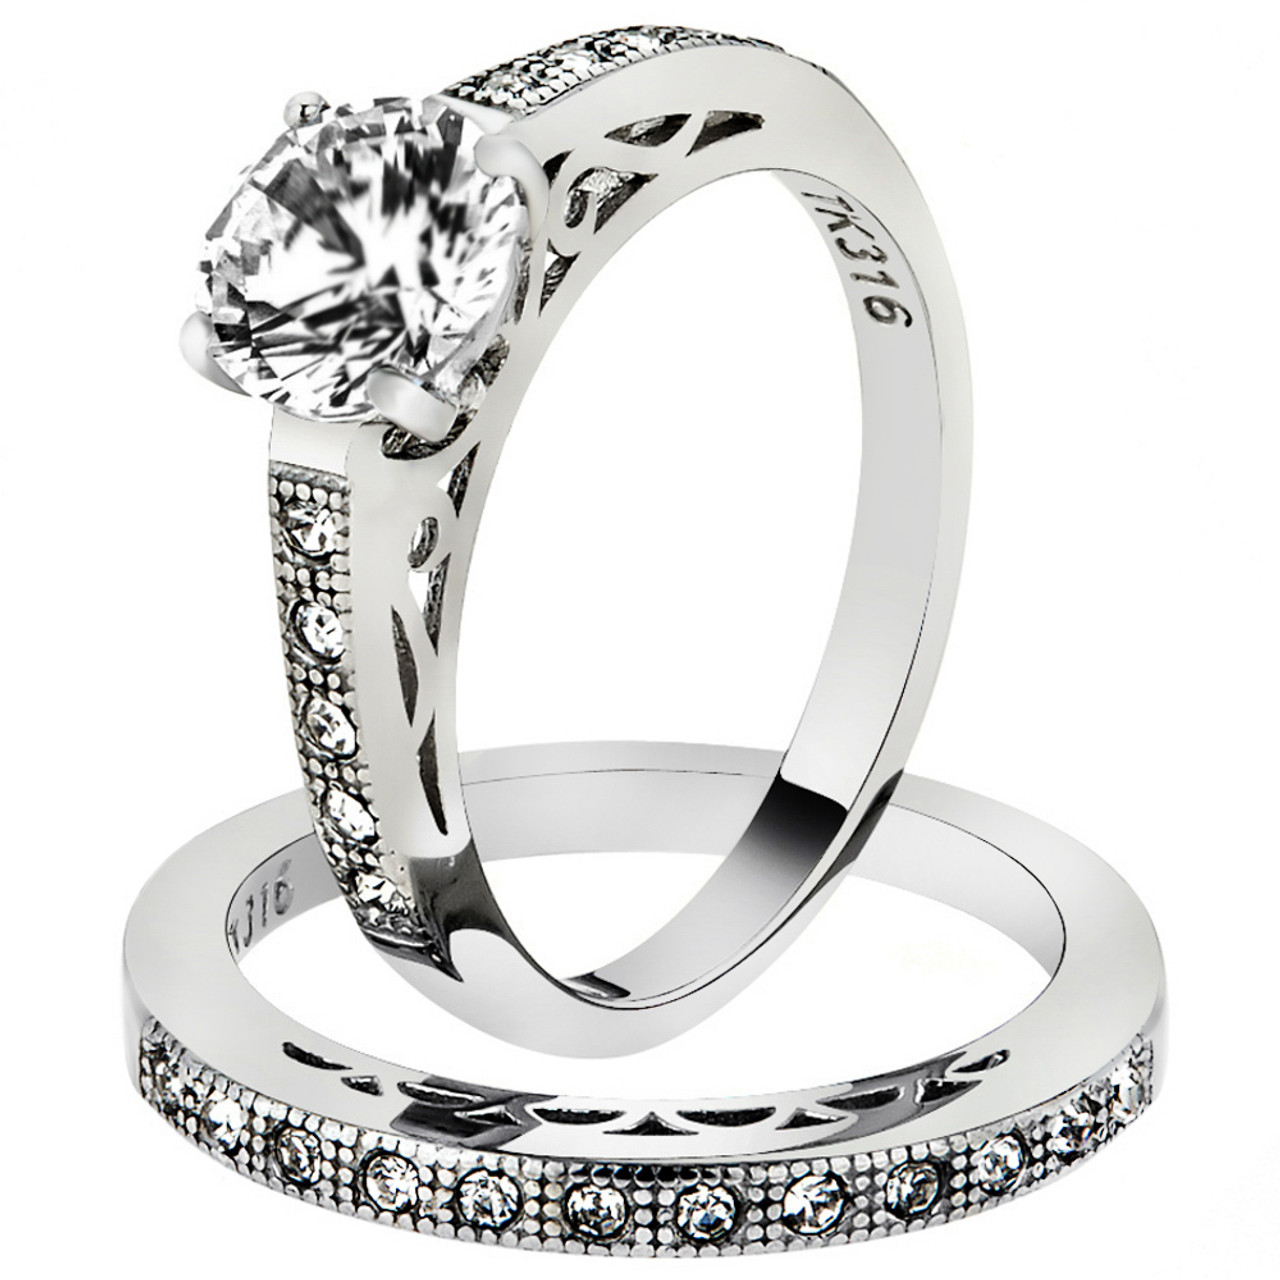 2.25 CT HALO ROUND CUT CZ BLACK STAINLESS STEEL WEDDING RING SET WOMEN/'S SZ 5-10